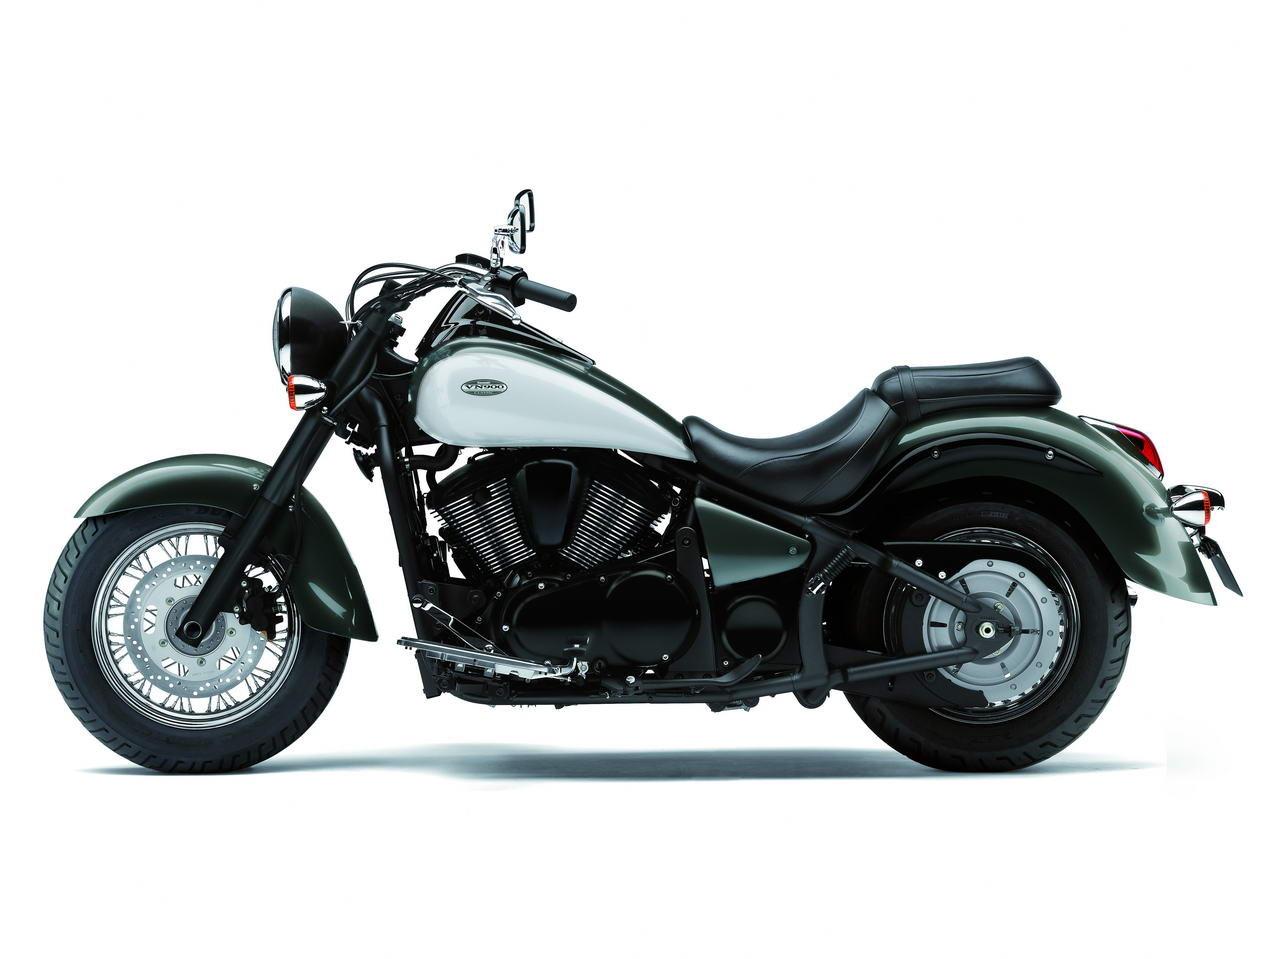 Listino Kawasaki W 800 Naked Mediand - image 15527_kawasaki-vn1700-classic-tourer on http://moto.motori.net